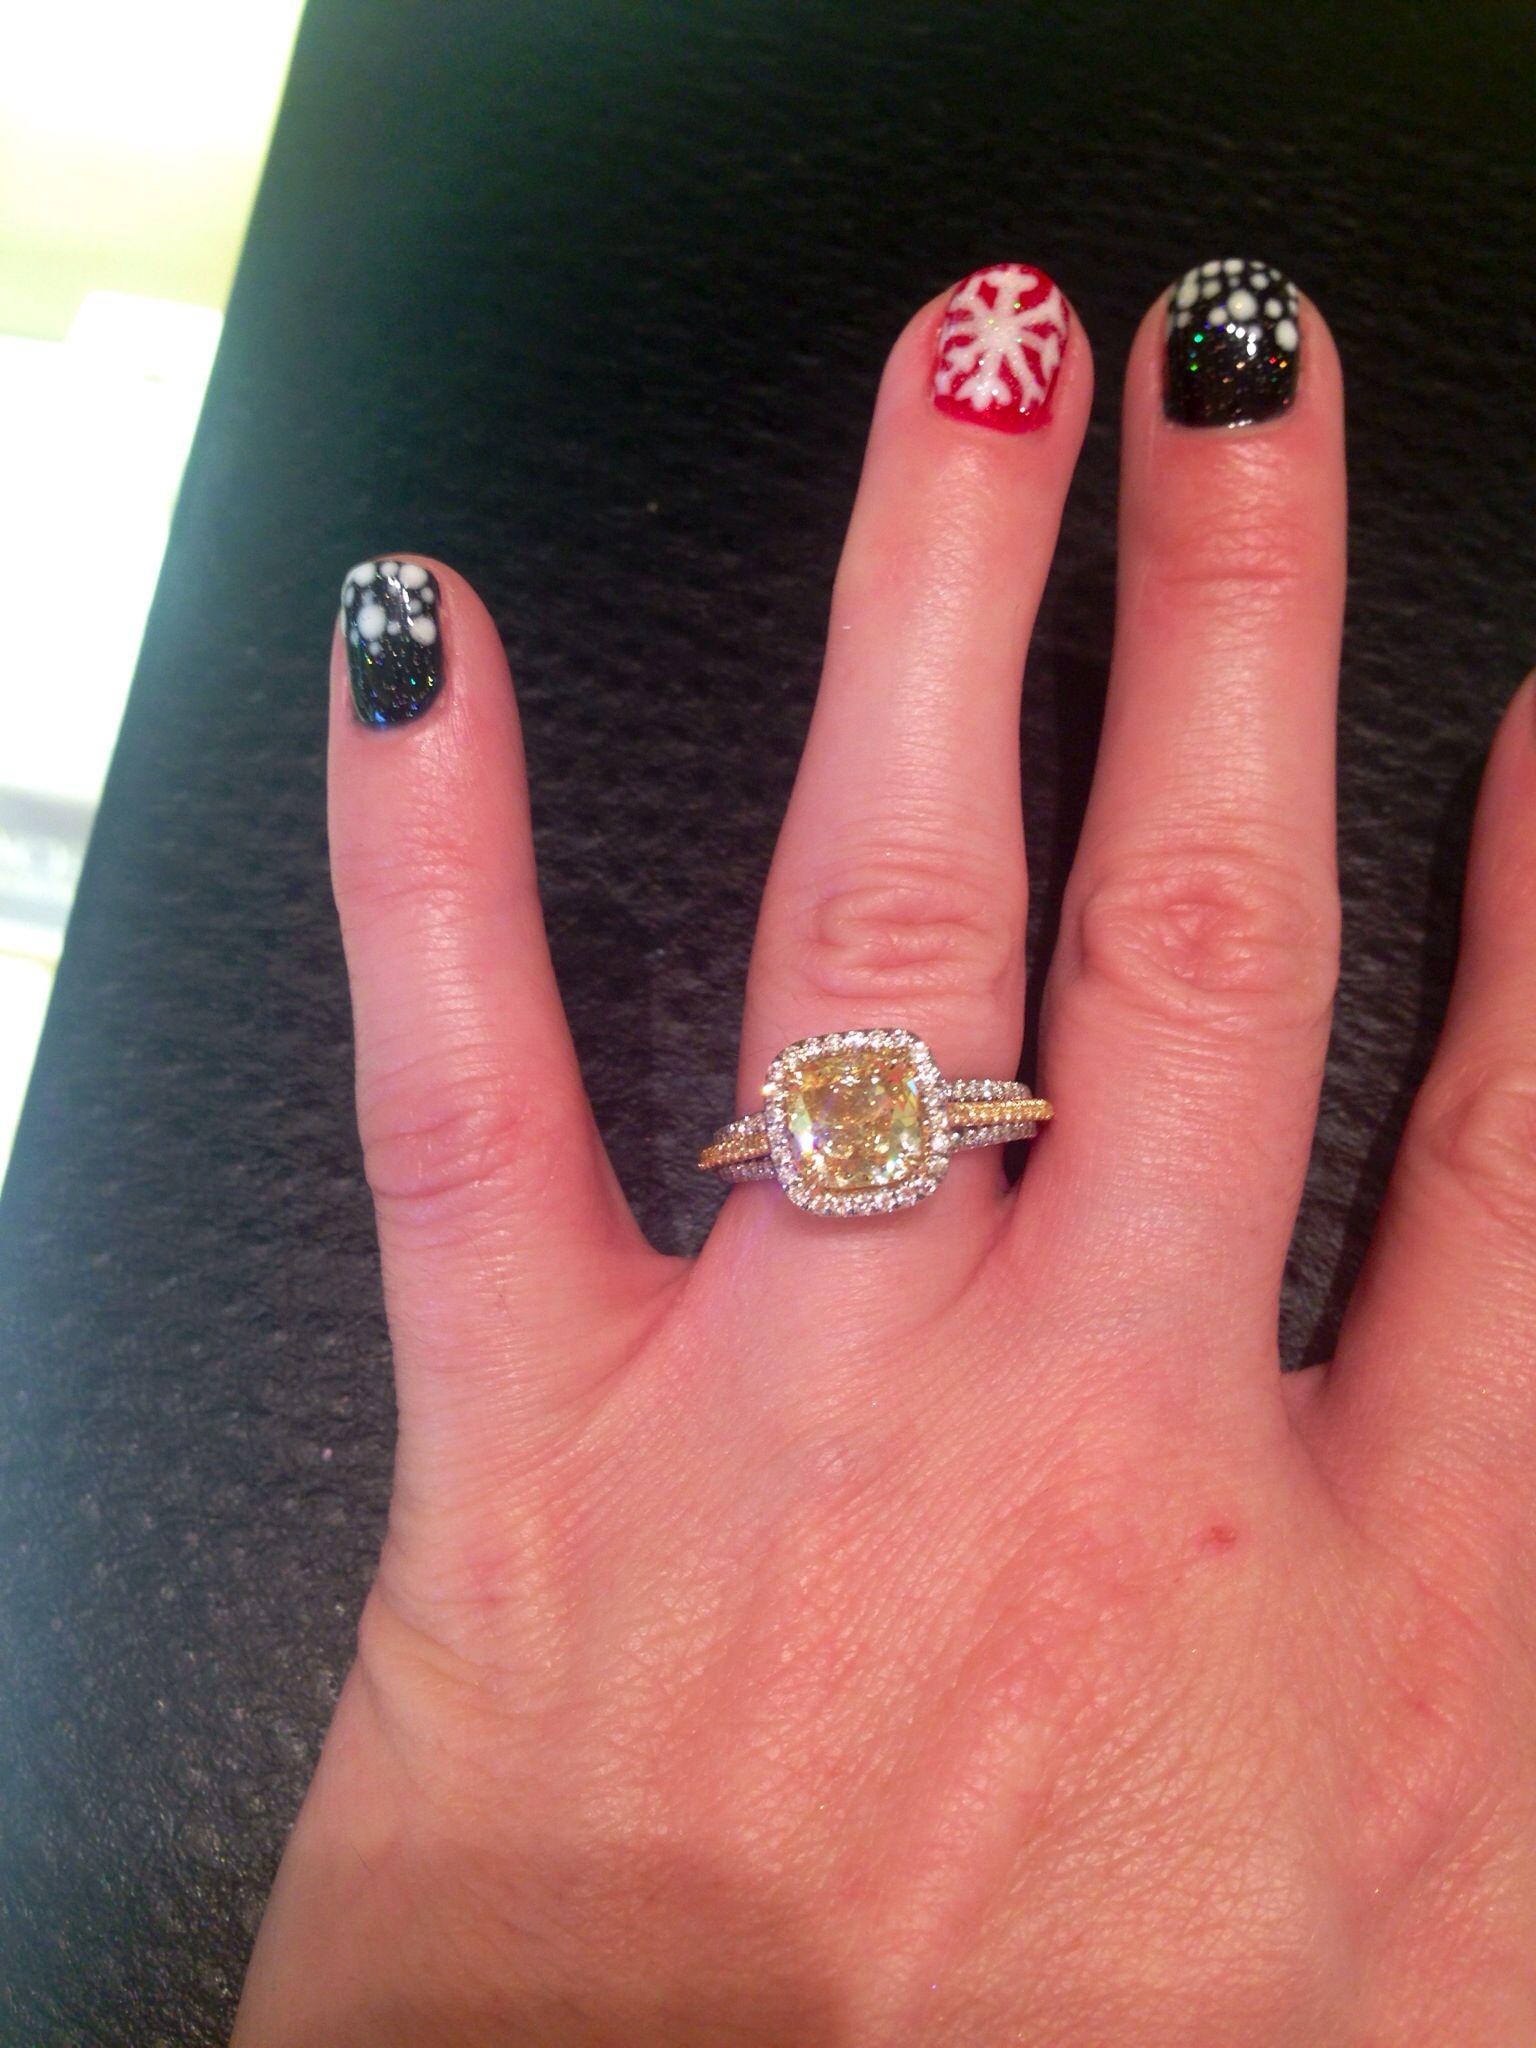 LeVian Yellow Diamond Ring!   Jewelry   Pinterest   Diamond and Ring